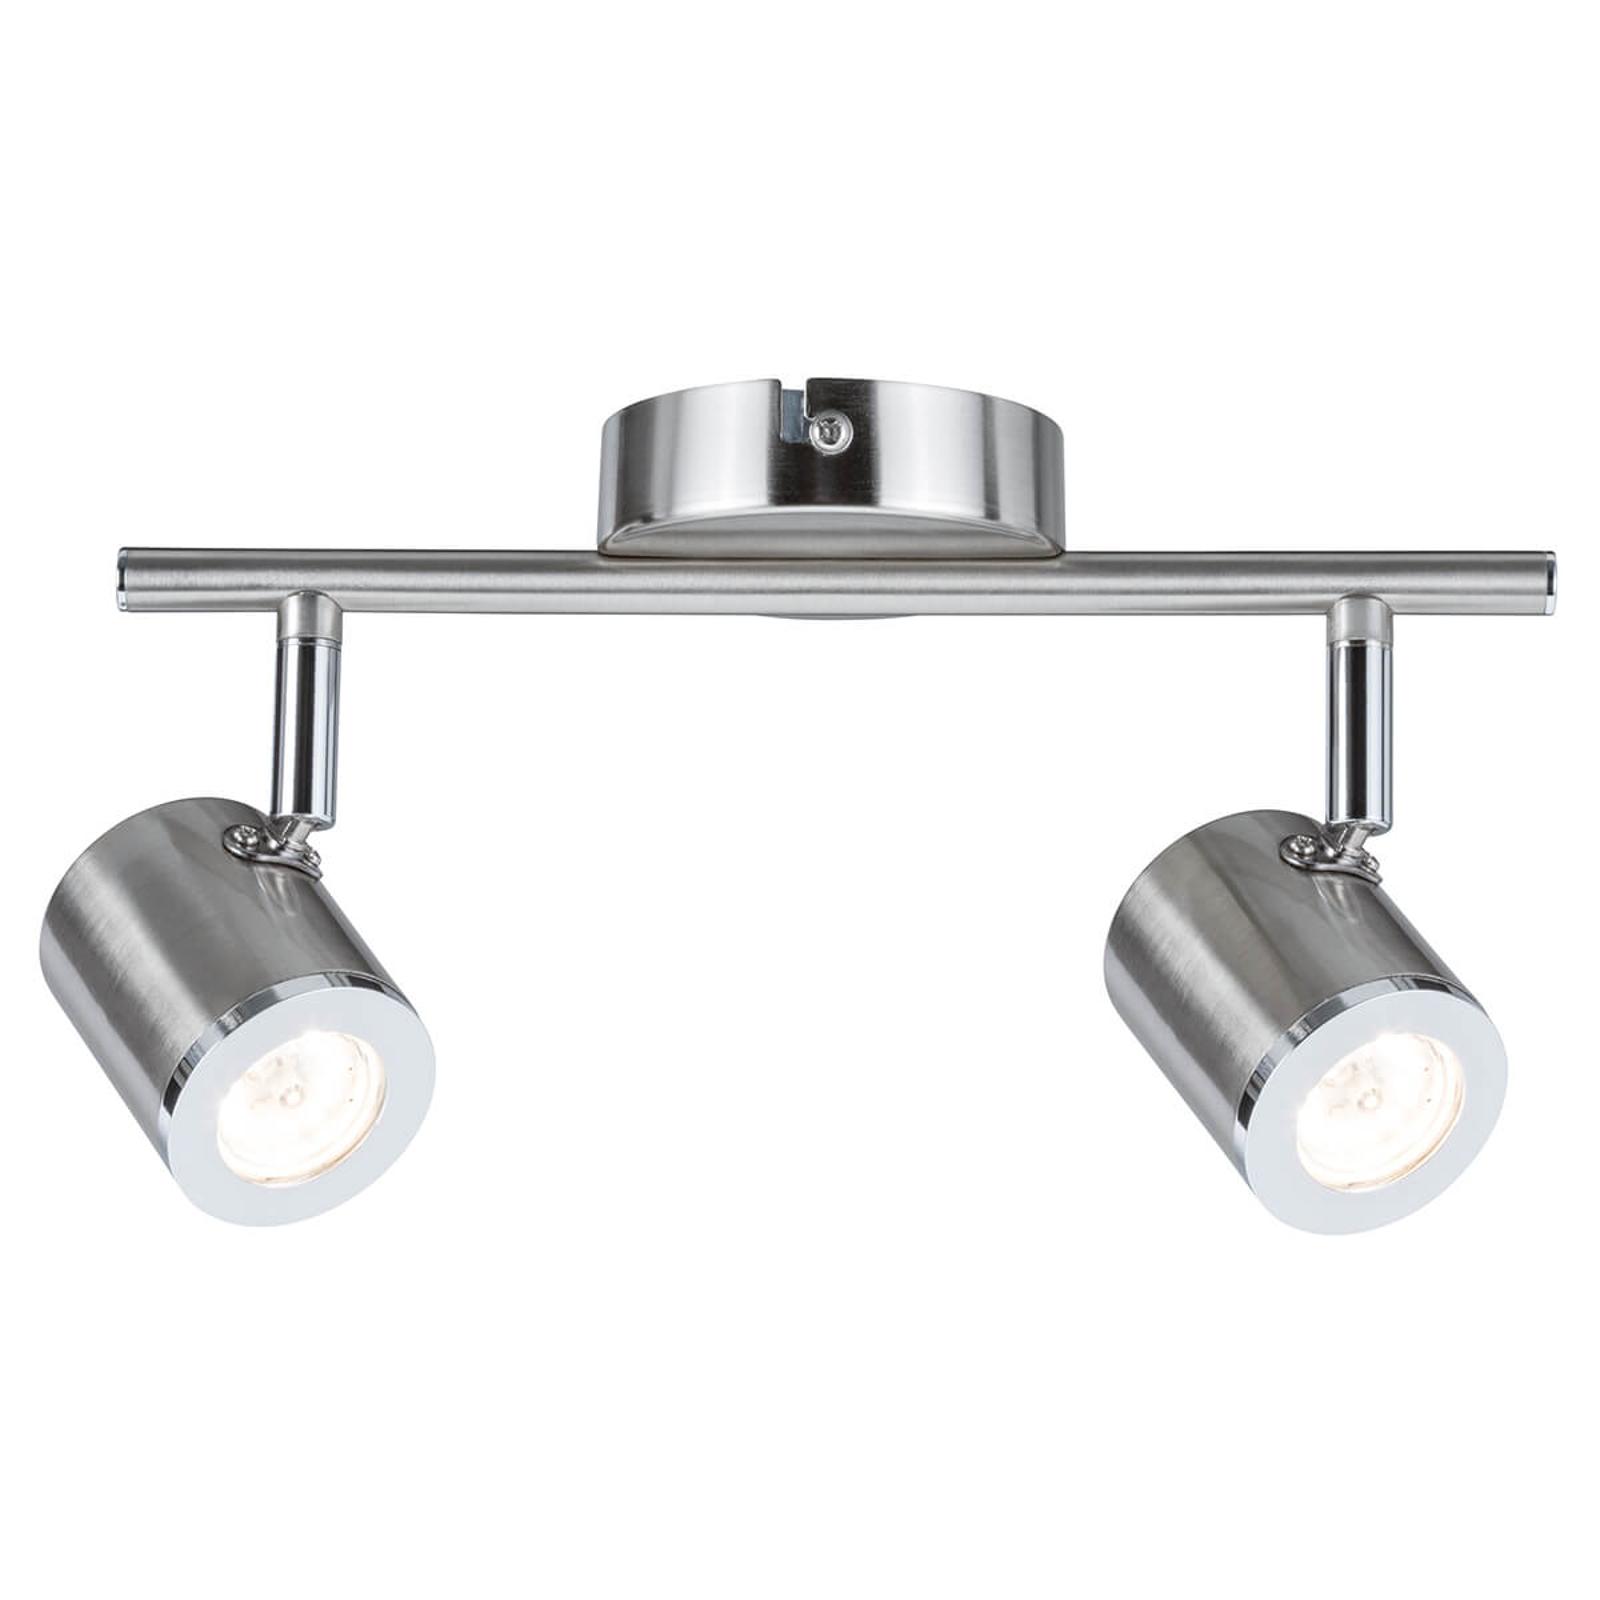 Paulmann Tumbler LED-Deckenleuchte, 2-flammig